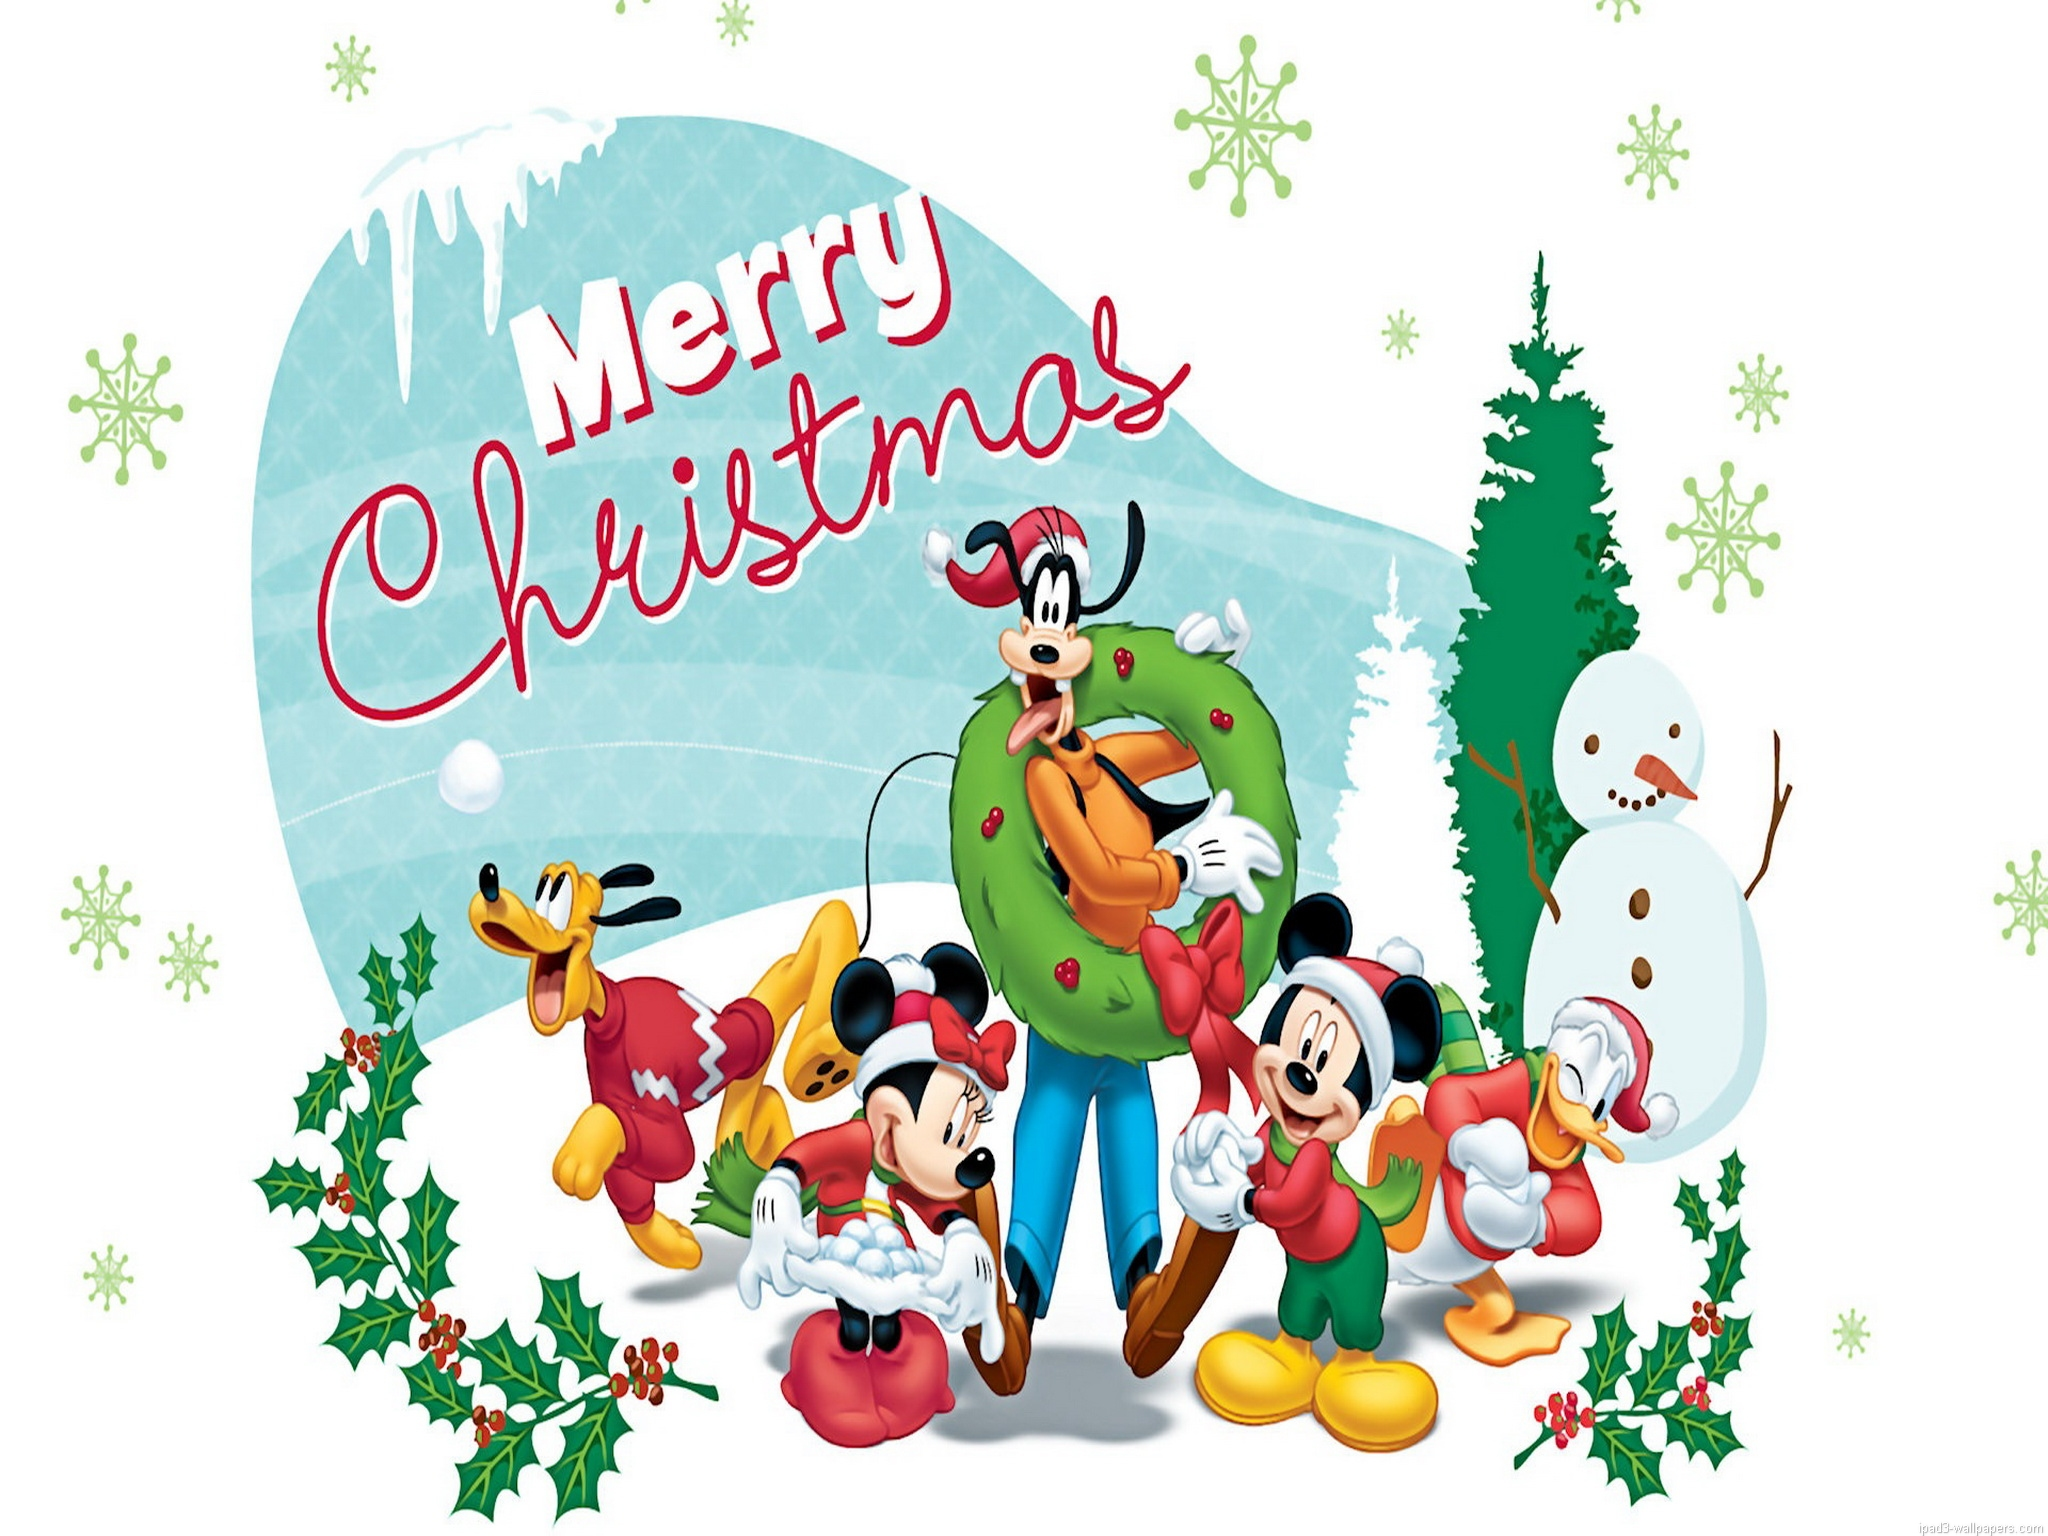 Free Ipad Wallpaper Christmas: Disney Christmas Wallpaper For IPad